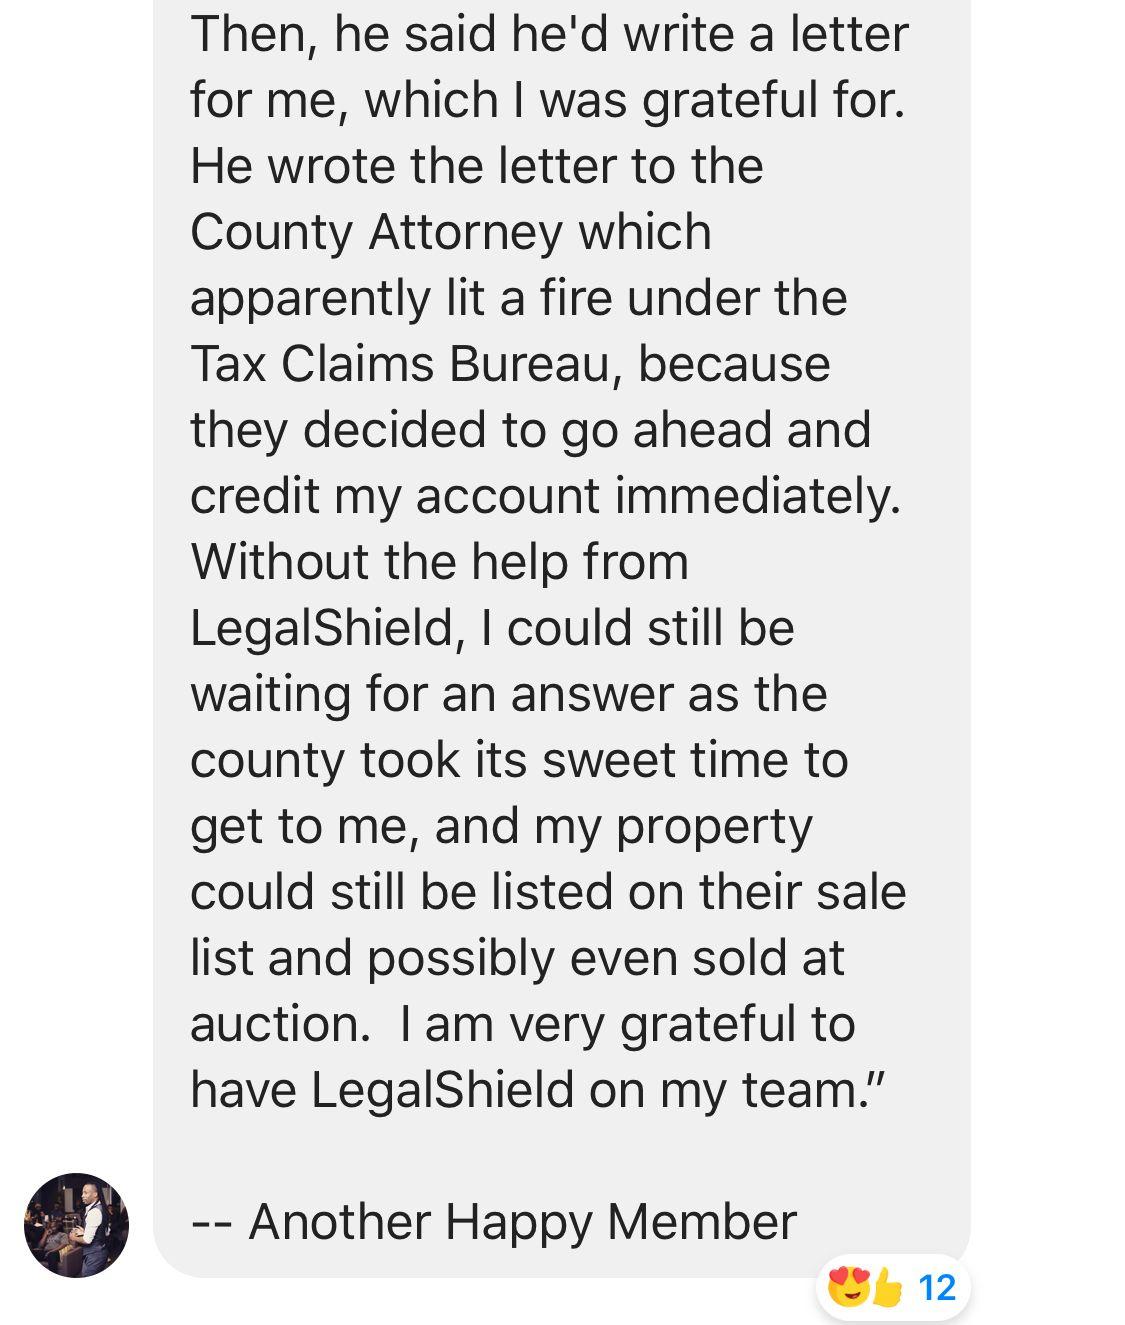 Pin by Antonio L. Holloman on Legal Shield Legalshield